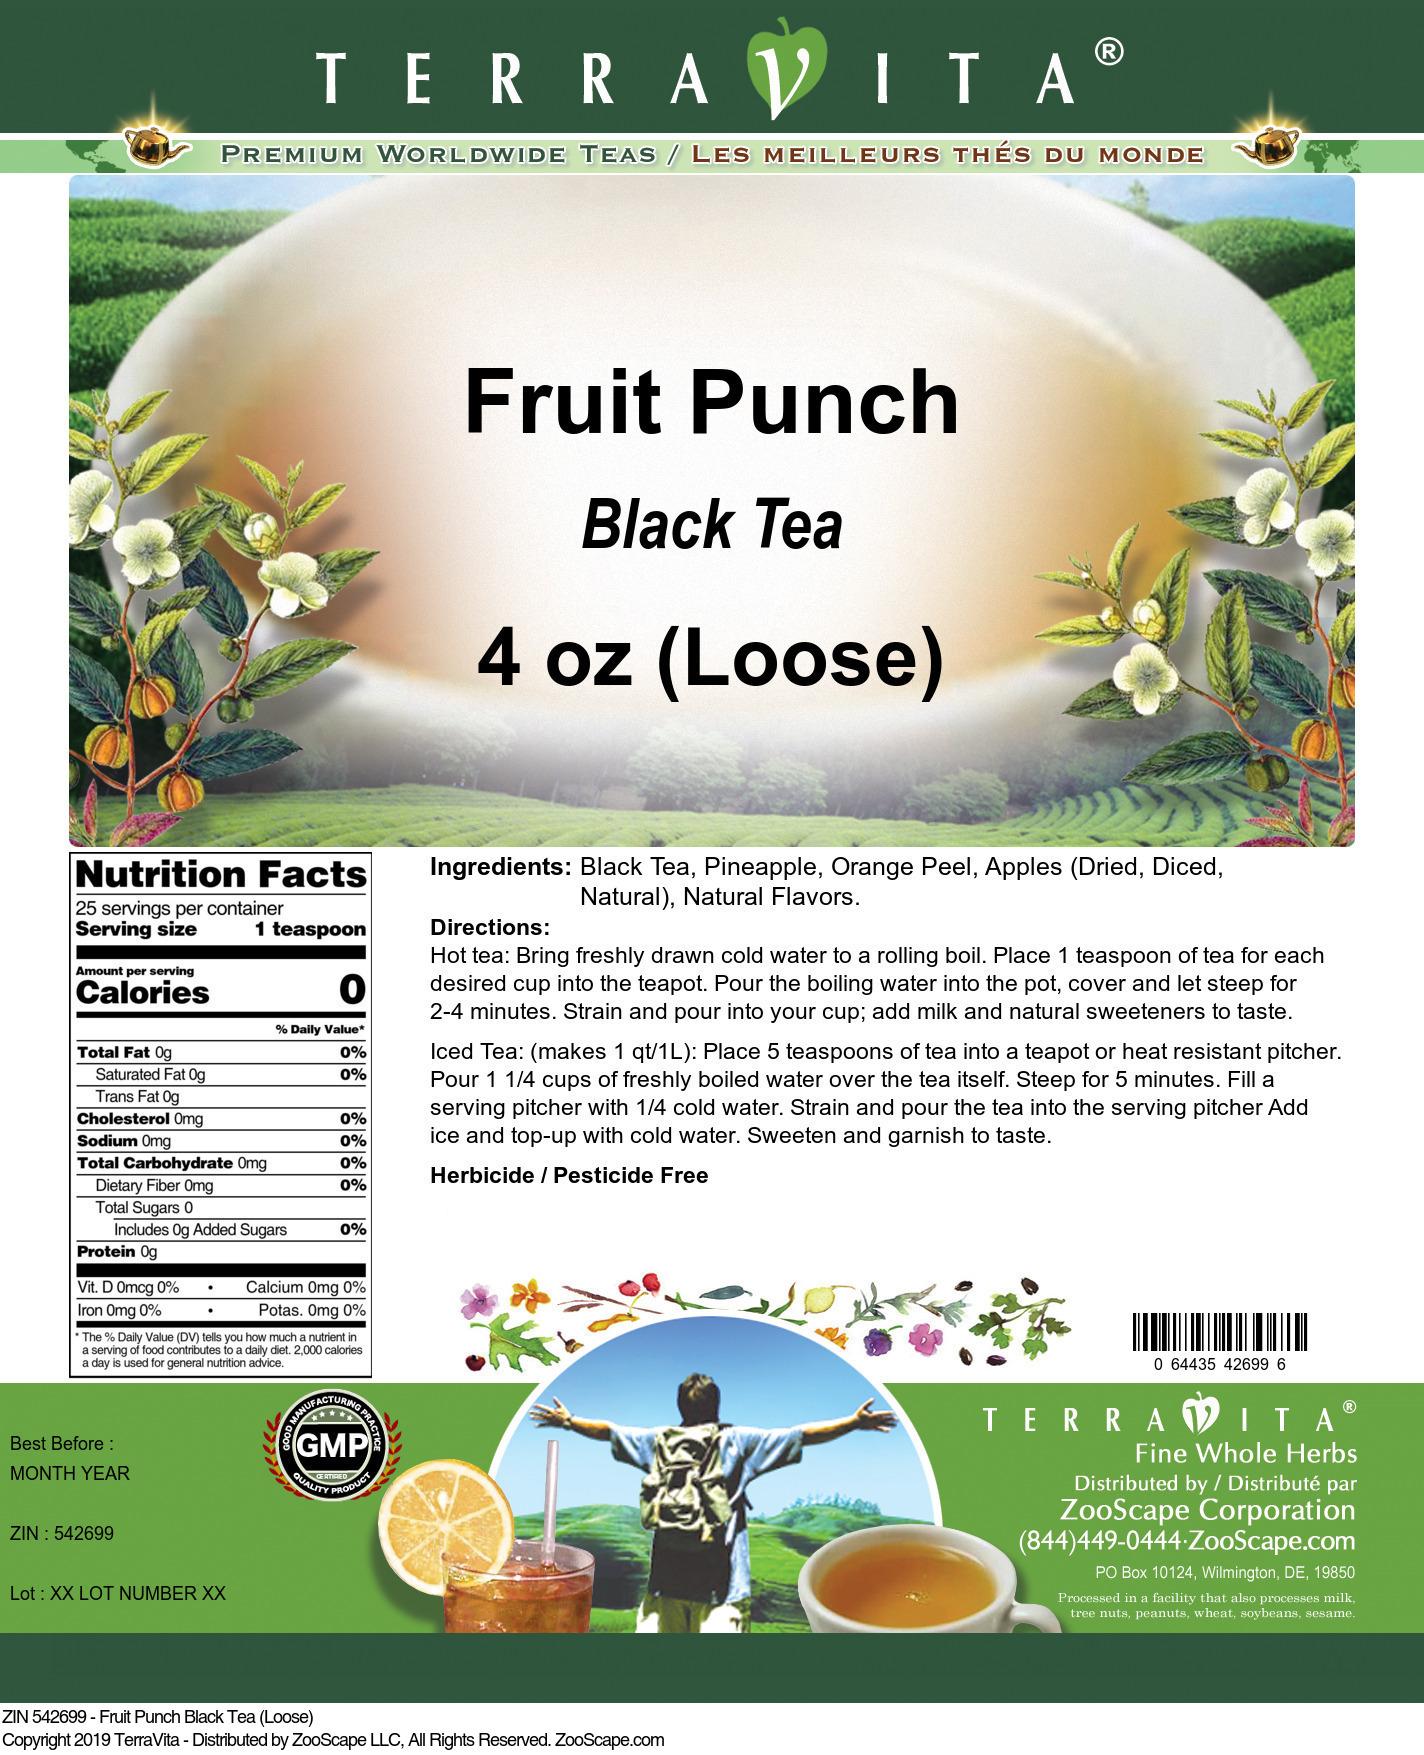 Fruit Punch Black Tea